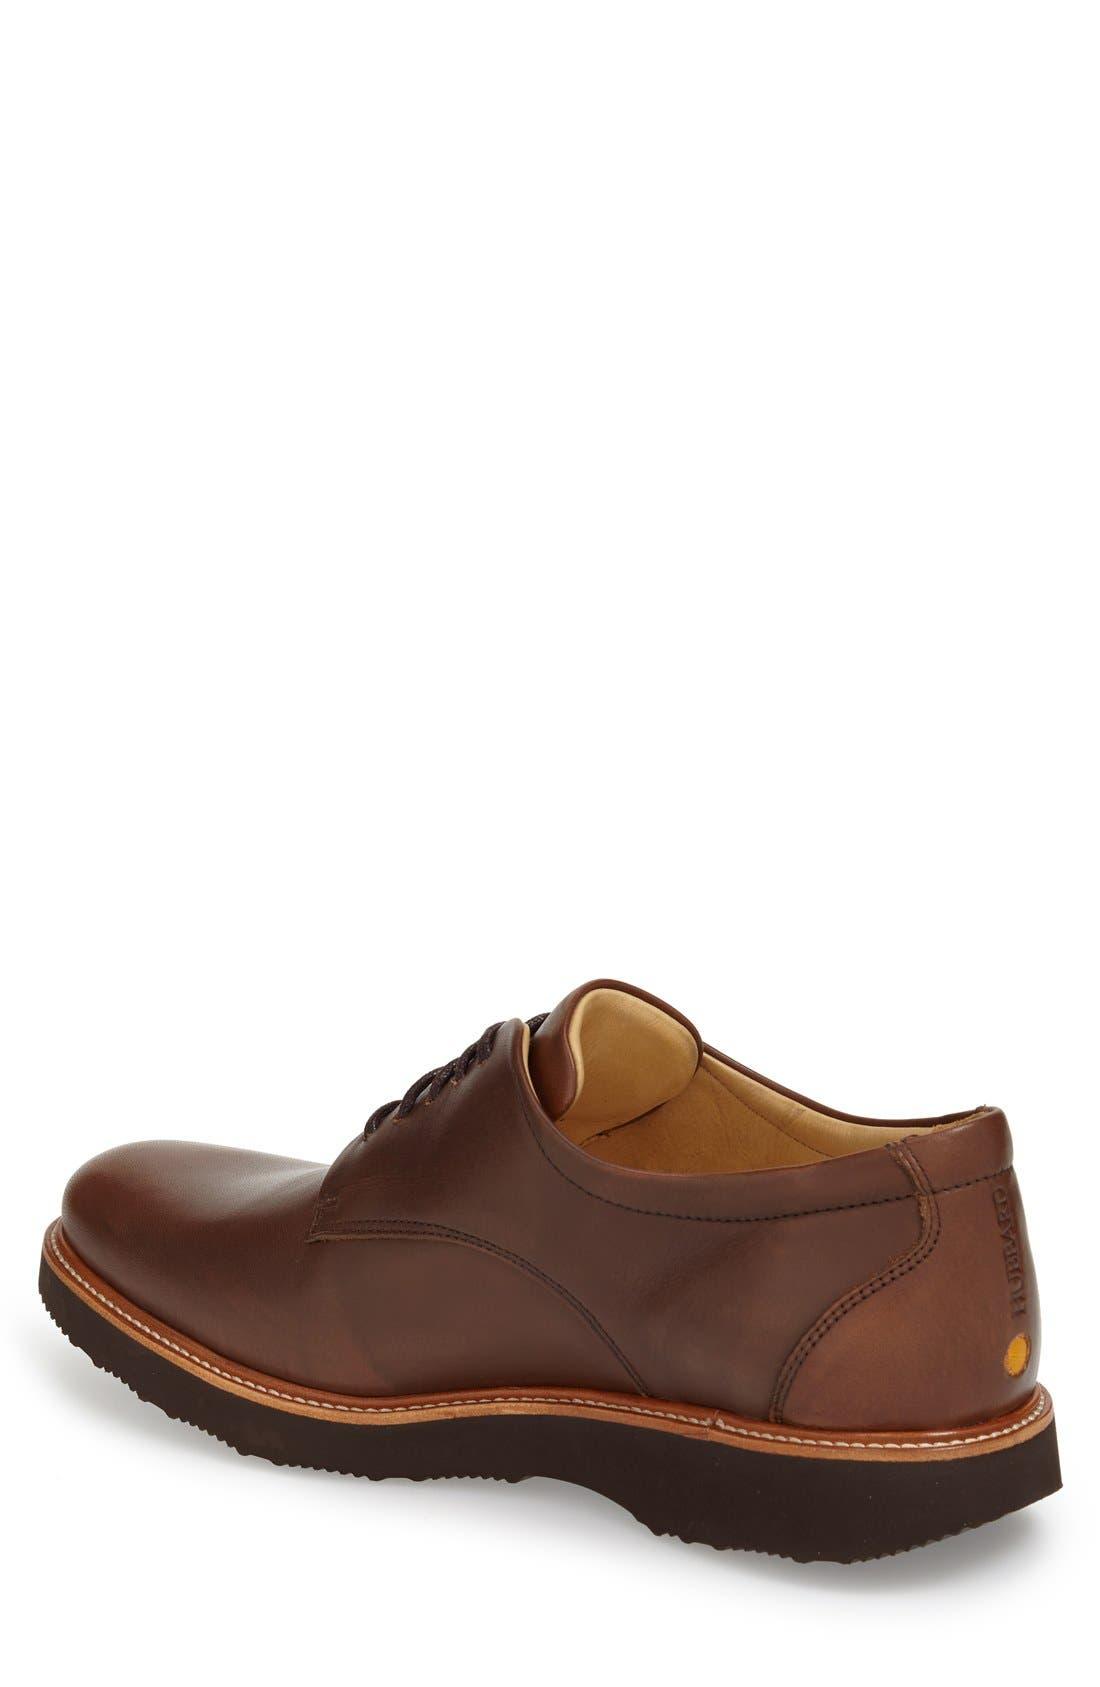 Alternate Image 2  - Samuel Hubbard 'Founder' Plain Toe Derby (Men)